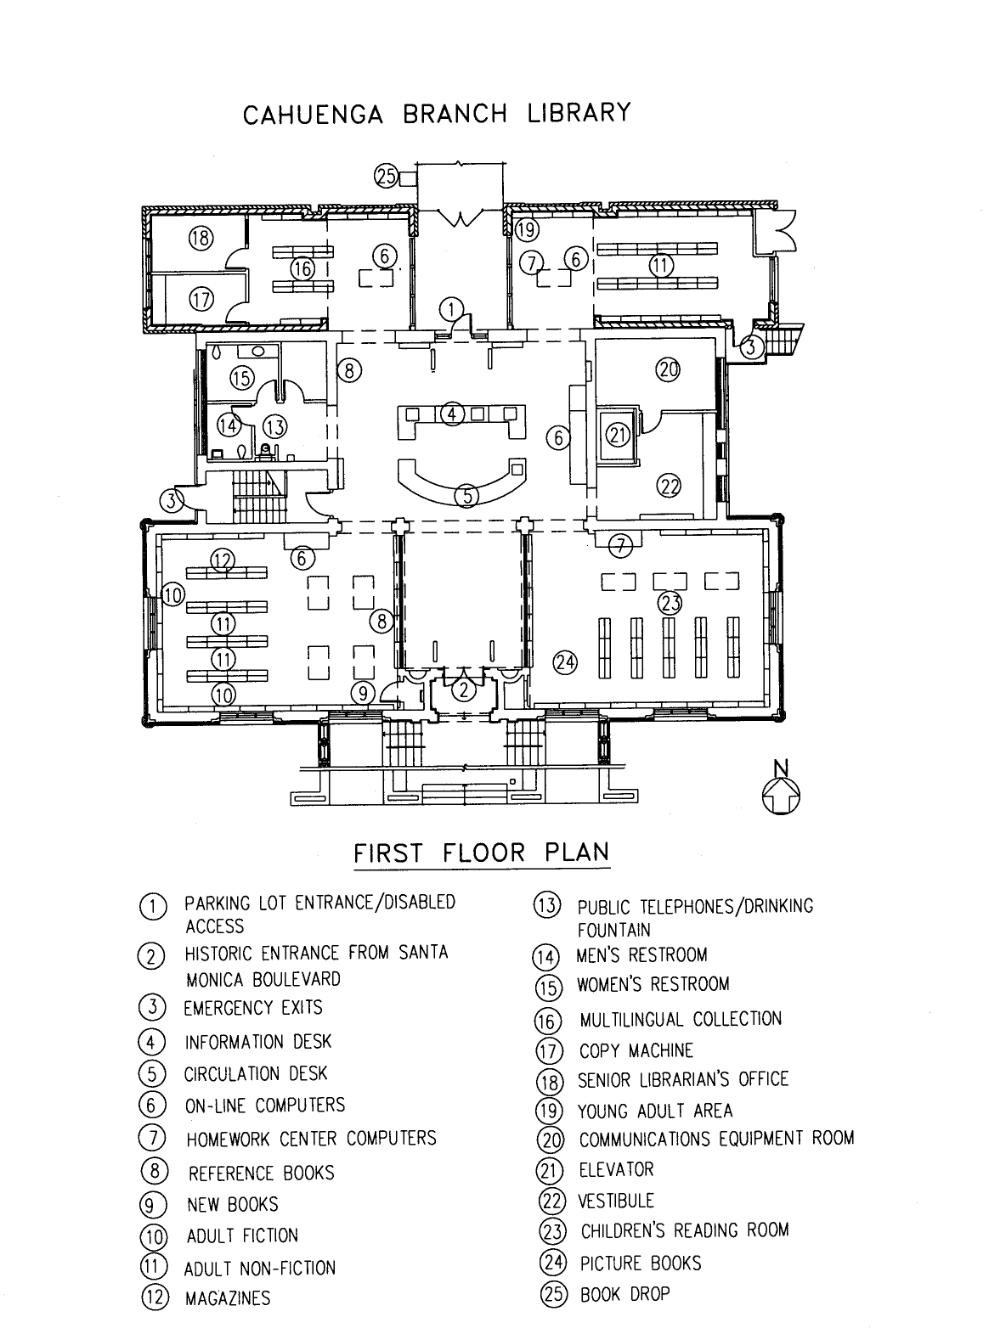 Los Angeles Public Library Plan Google Search Library Floor Plan Library Plan Public Library Design